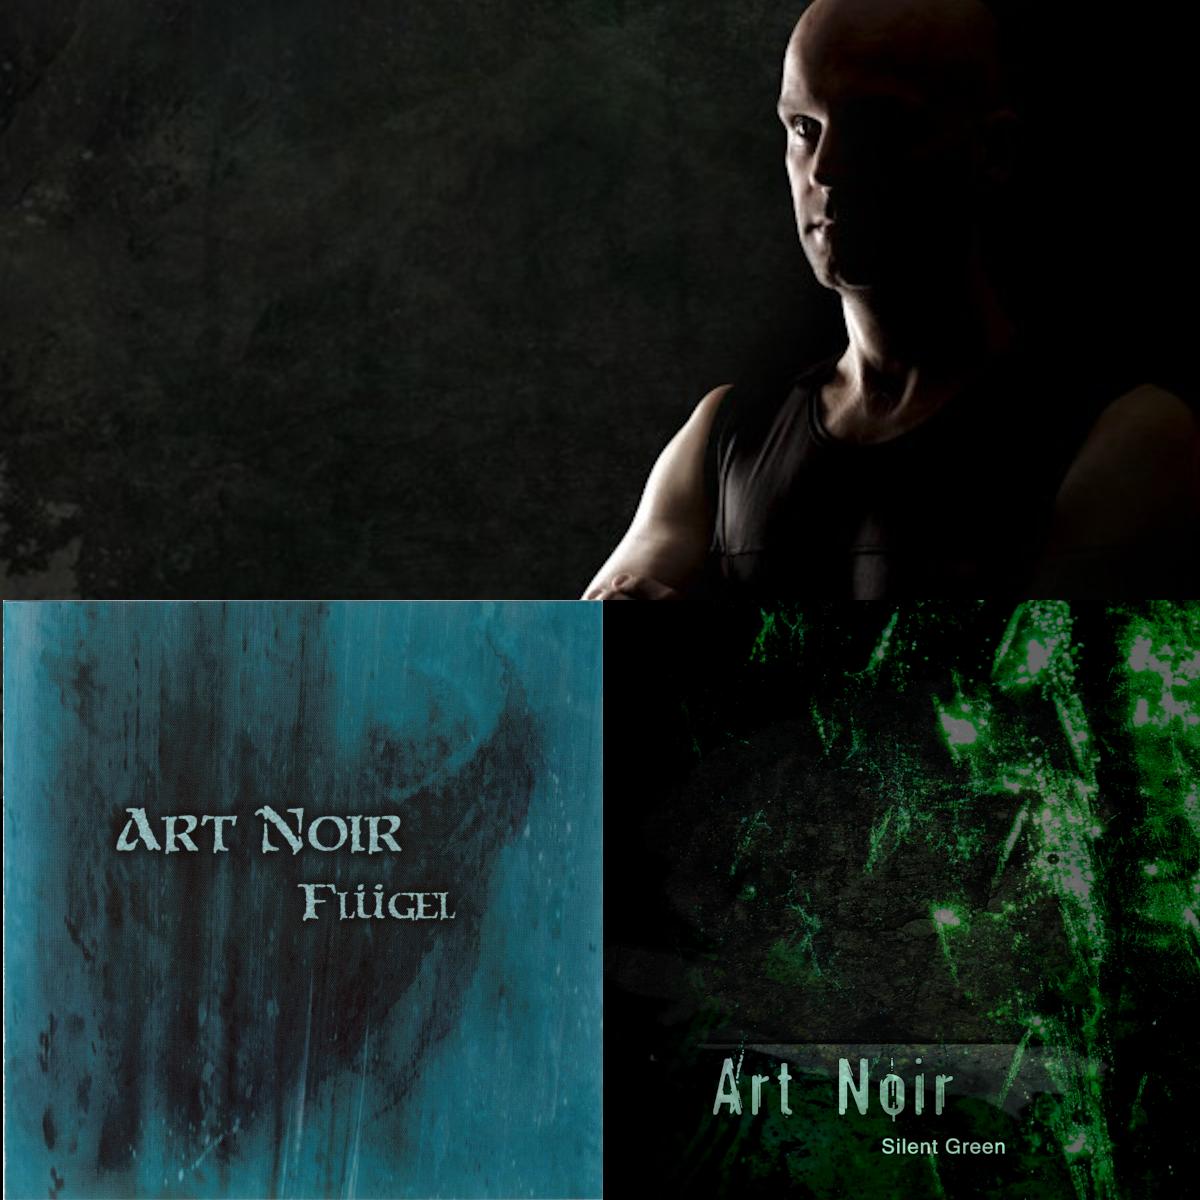 Art Noir Full Digital Discography